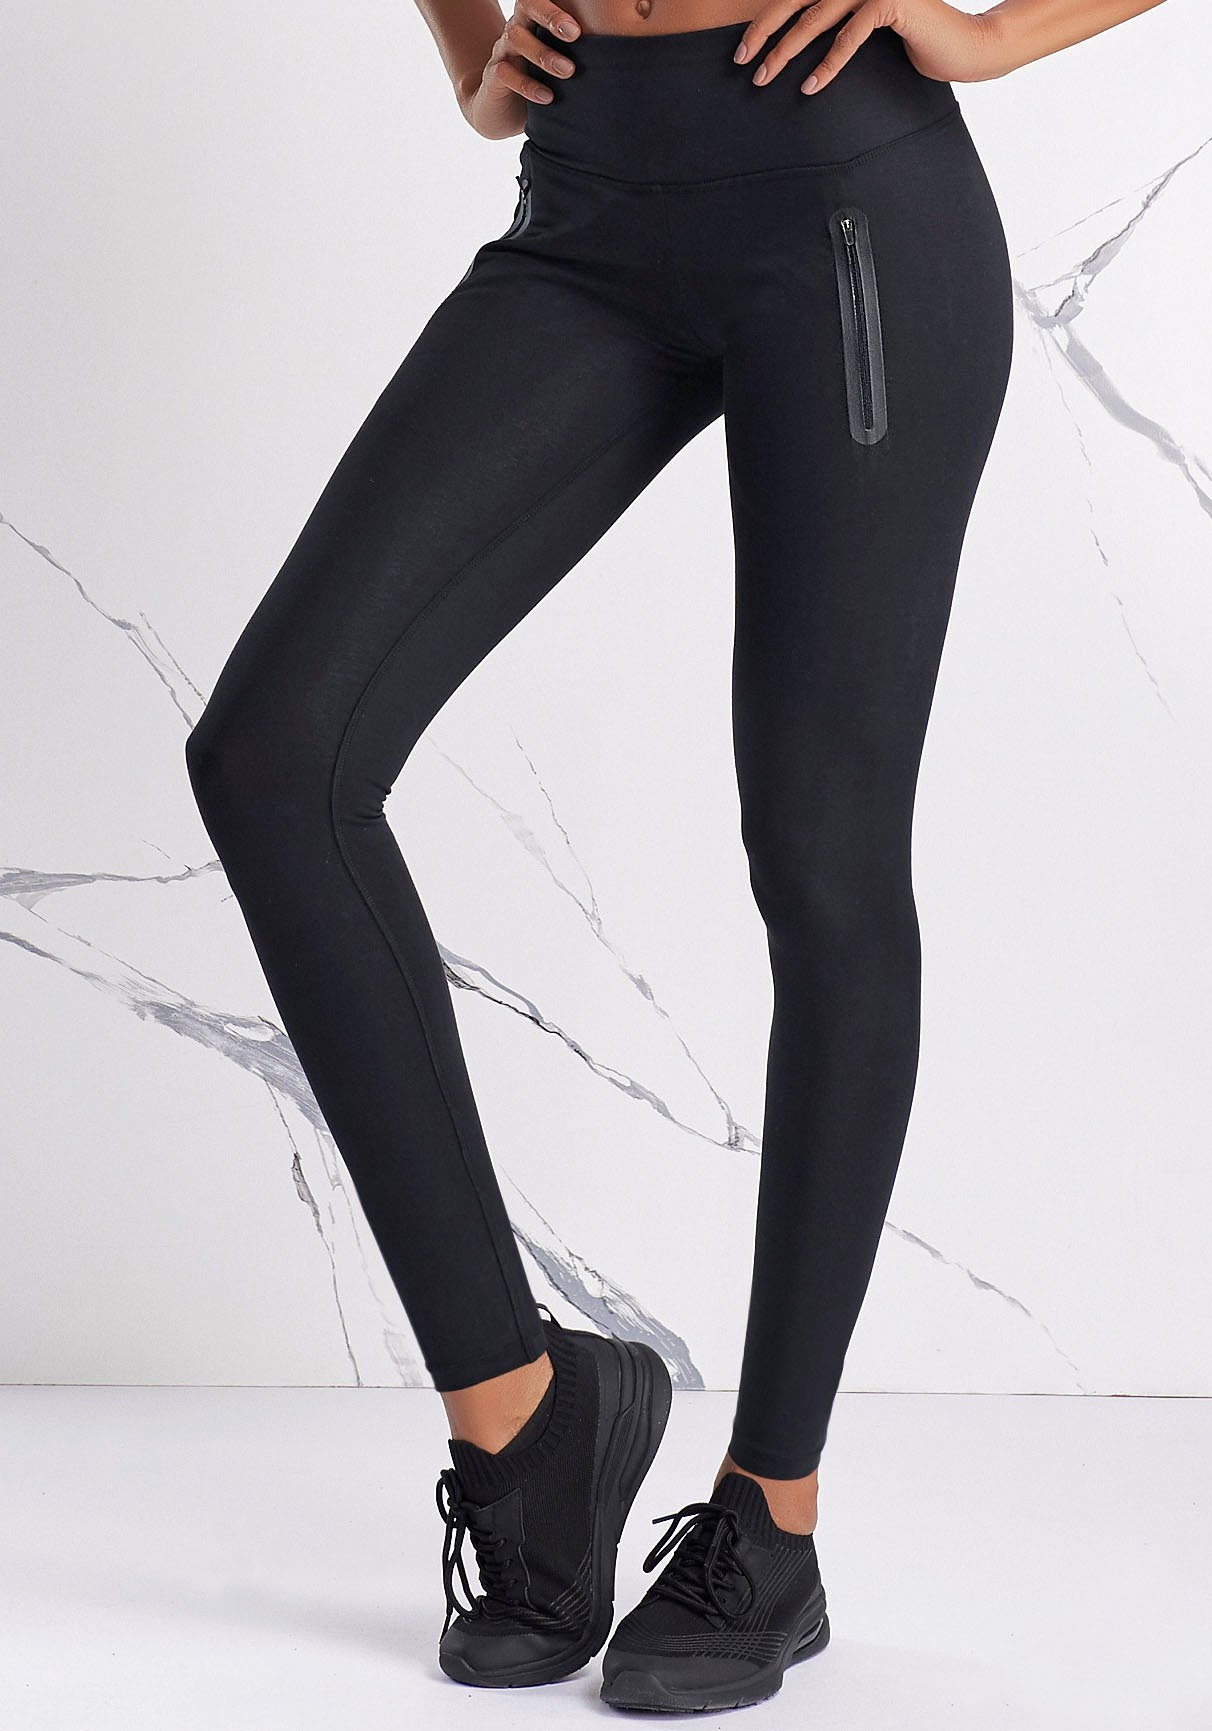 LASCANA ACTIVE legging bij Lascana online kopen